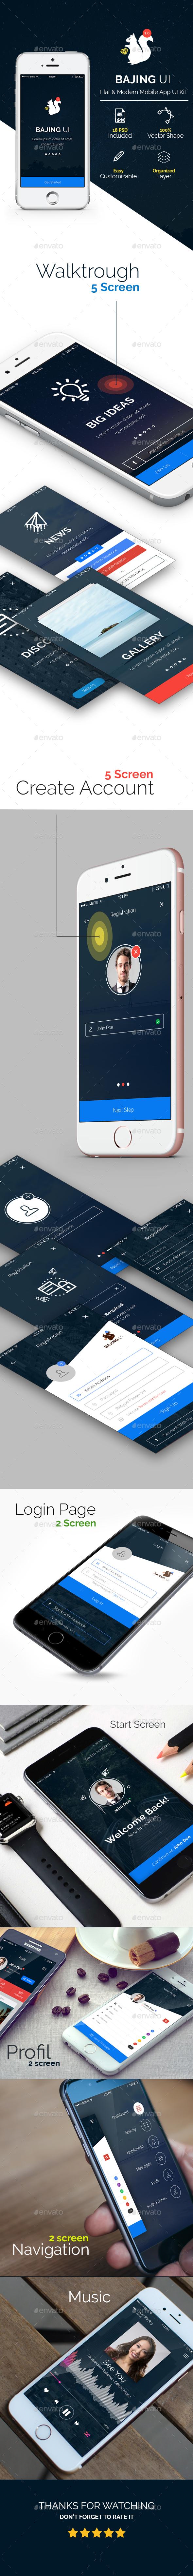 Bajing UI - Mobile App UI Kit (User Interfaces)